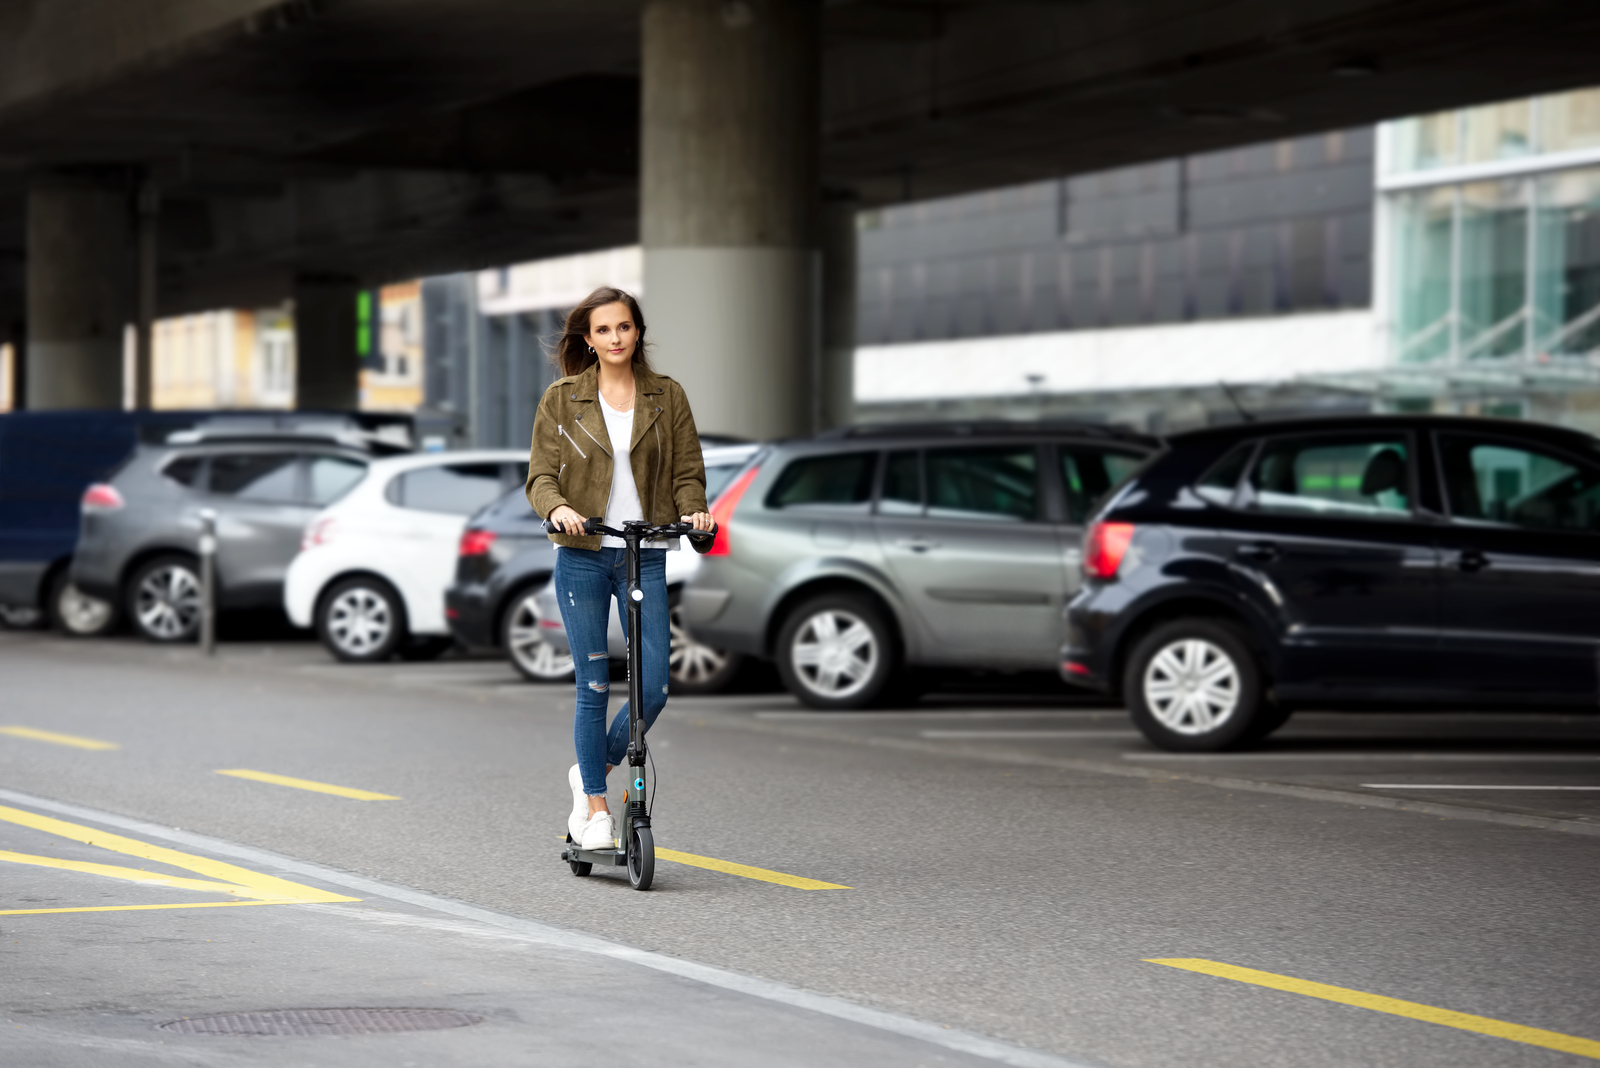 Micro Mobility: monopattini nei grandi centri urbani per la fase 2 thumbnail